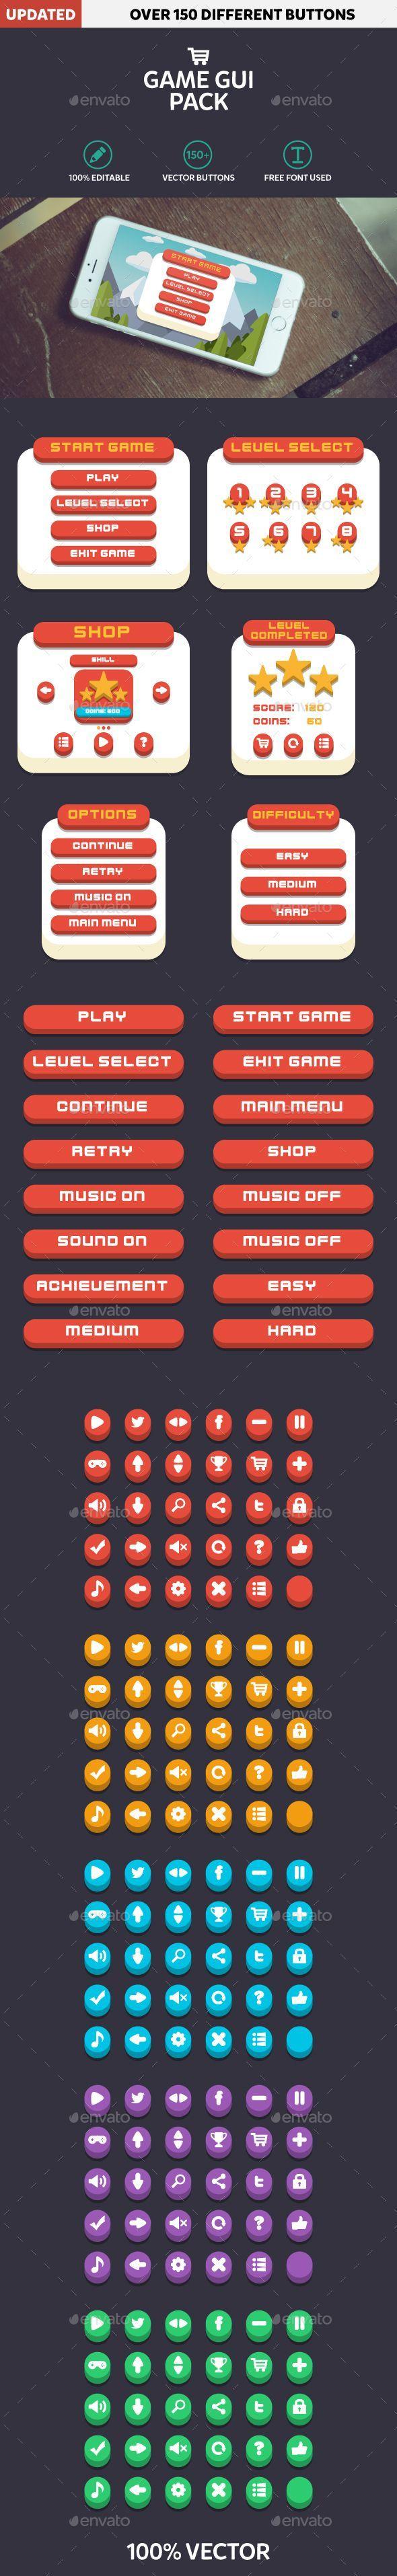 Mobile Game GUI Pack Flat Modern Template Transparent PNG, Vector EPS, AI Illustrator. Download here: https://graphicriver.net/item/mobile-game-gui-pack-flat-modern/17091409?ref=ksioks